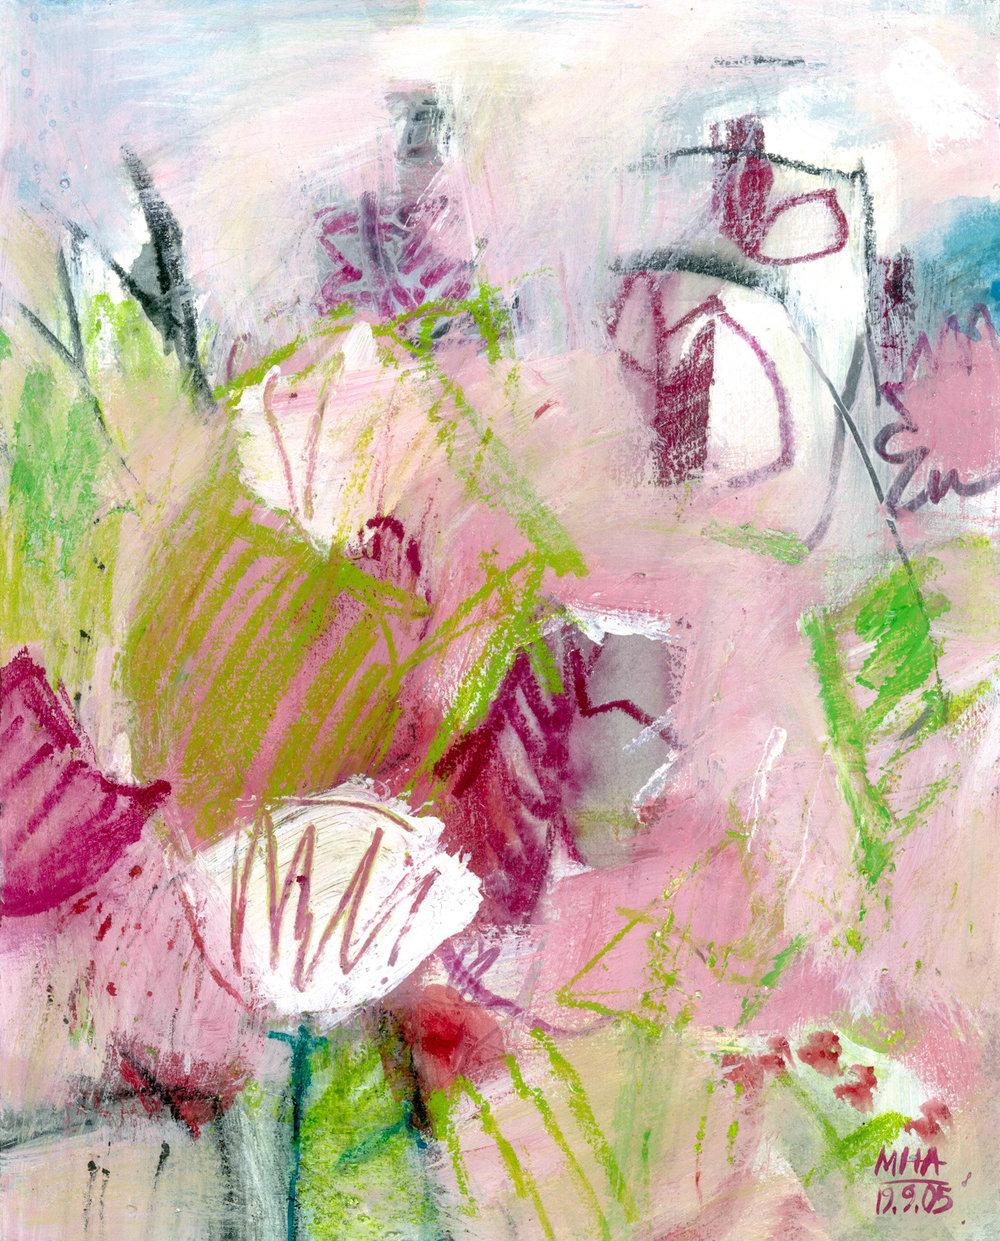 13  VERRÜCKT, 2005, Acryl auf Papier, 24x30 cm